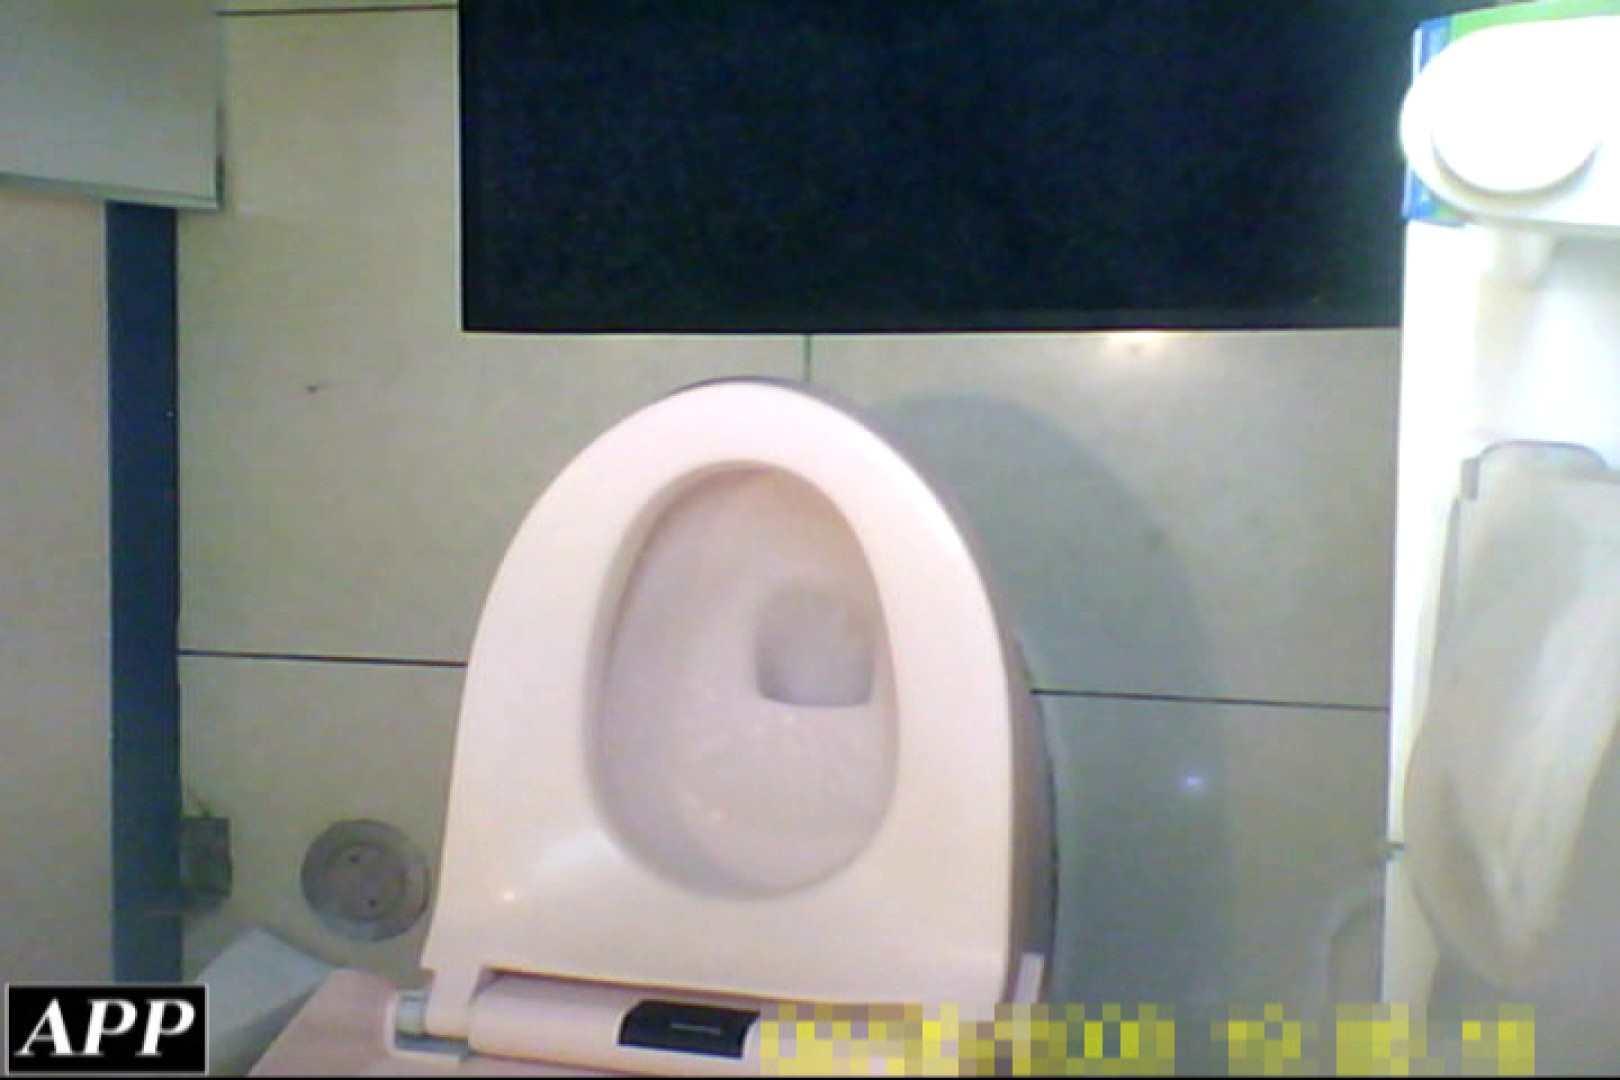 3視点洗面所 vol.004 OLエロ画像  107PICs 74